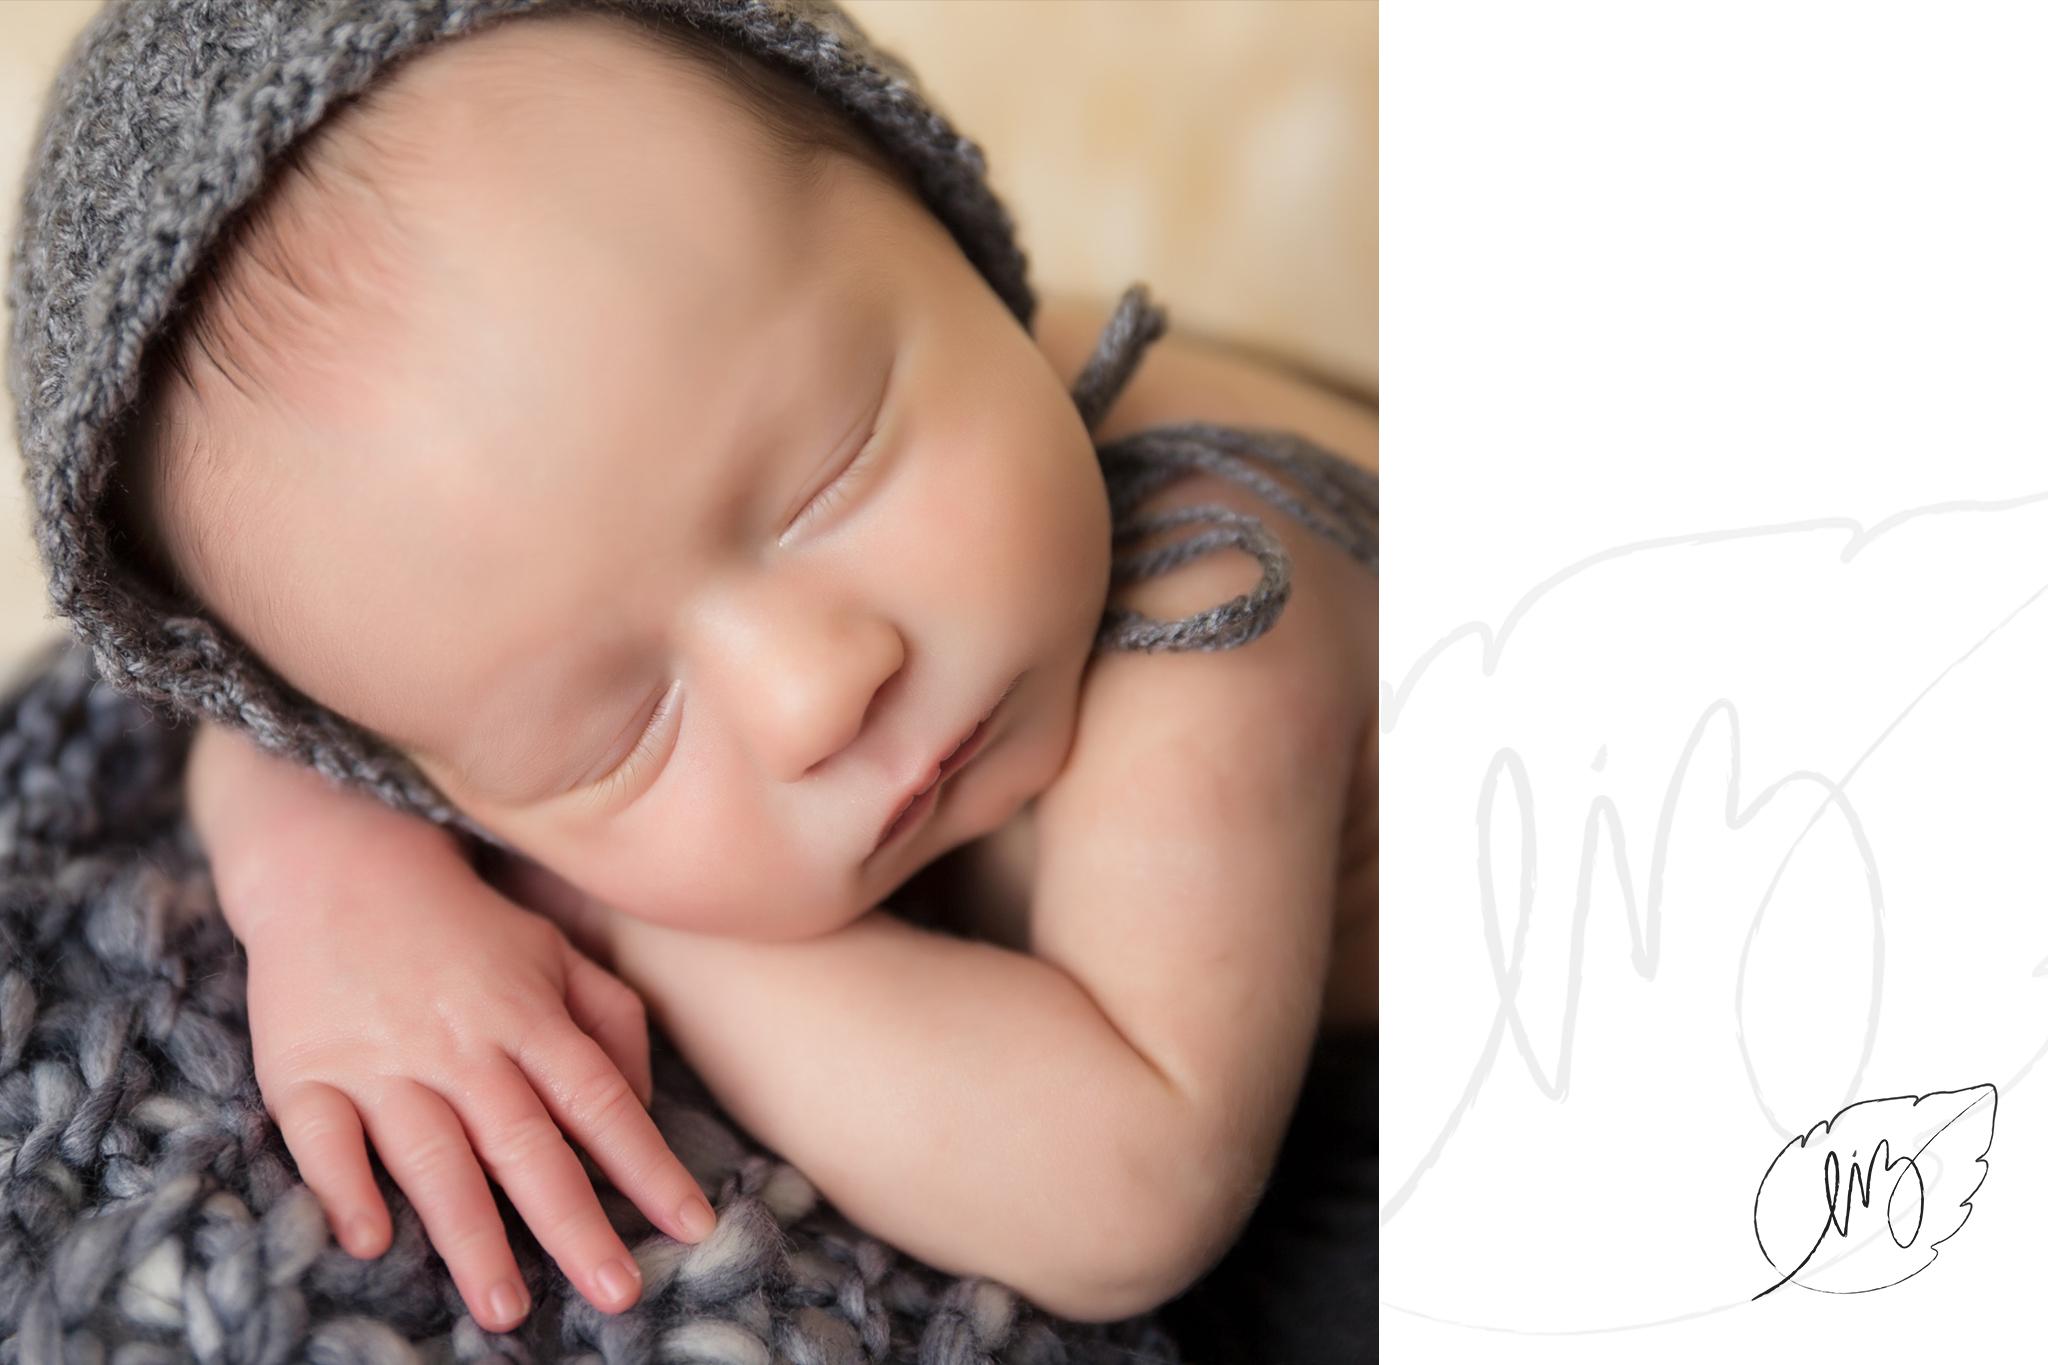 Victorville_Newborn_Photographer_LizPricePhotography_05.jpg